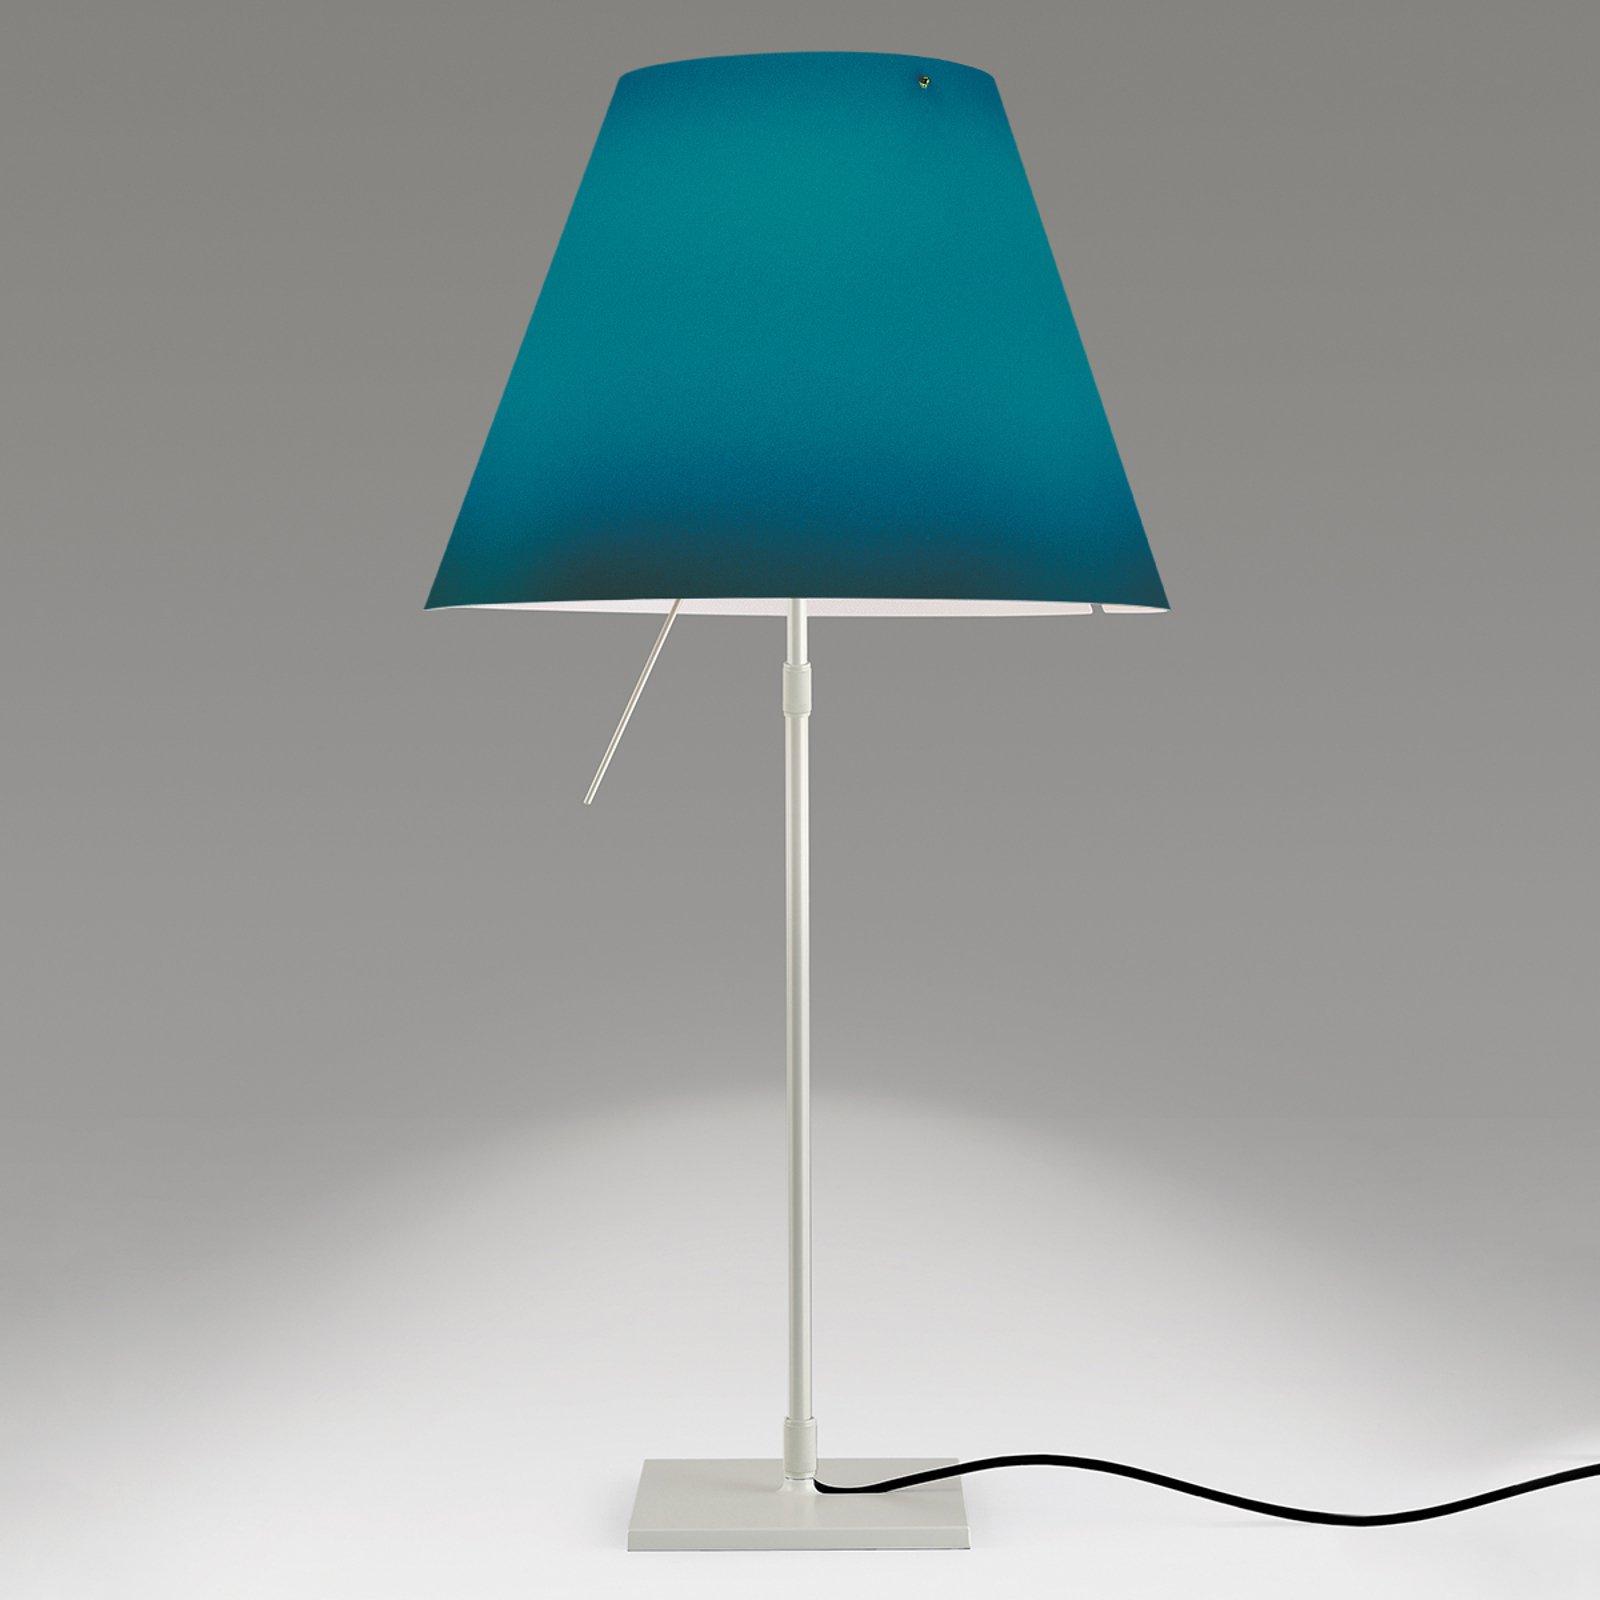 Dekorativ LED bordlampe Costanza i blått